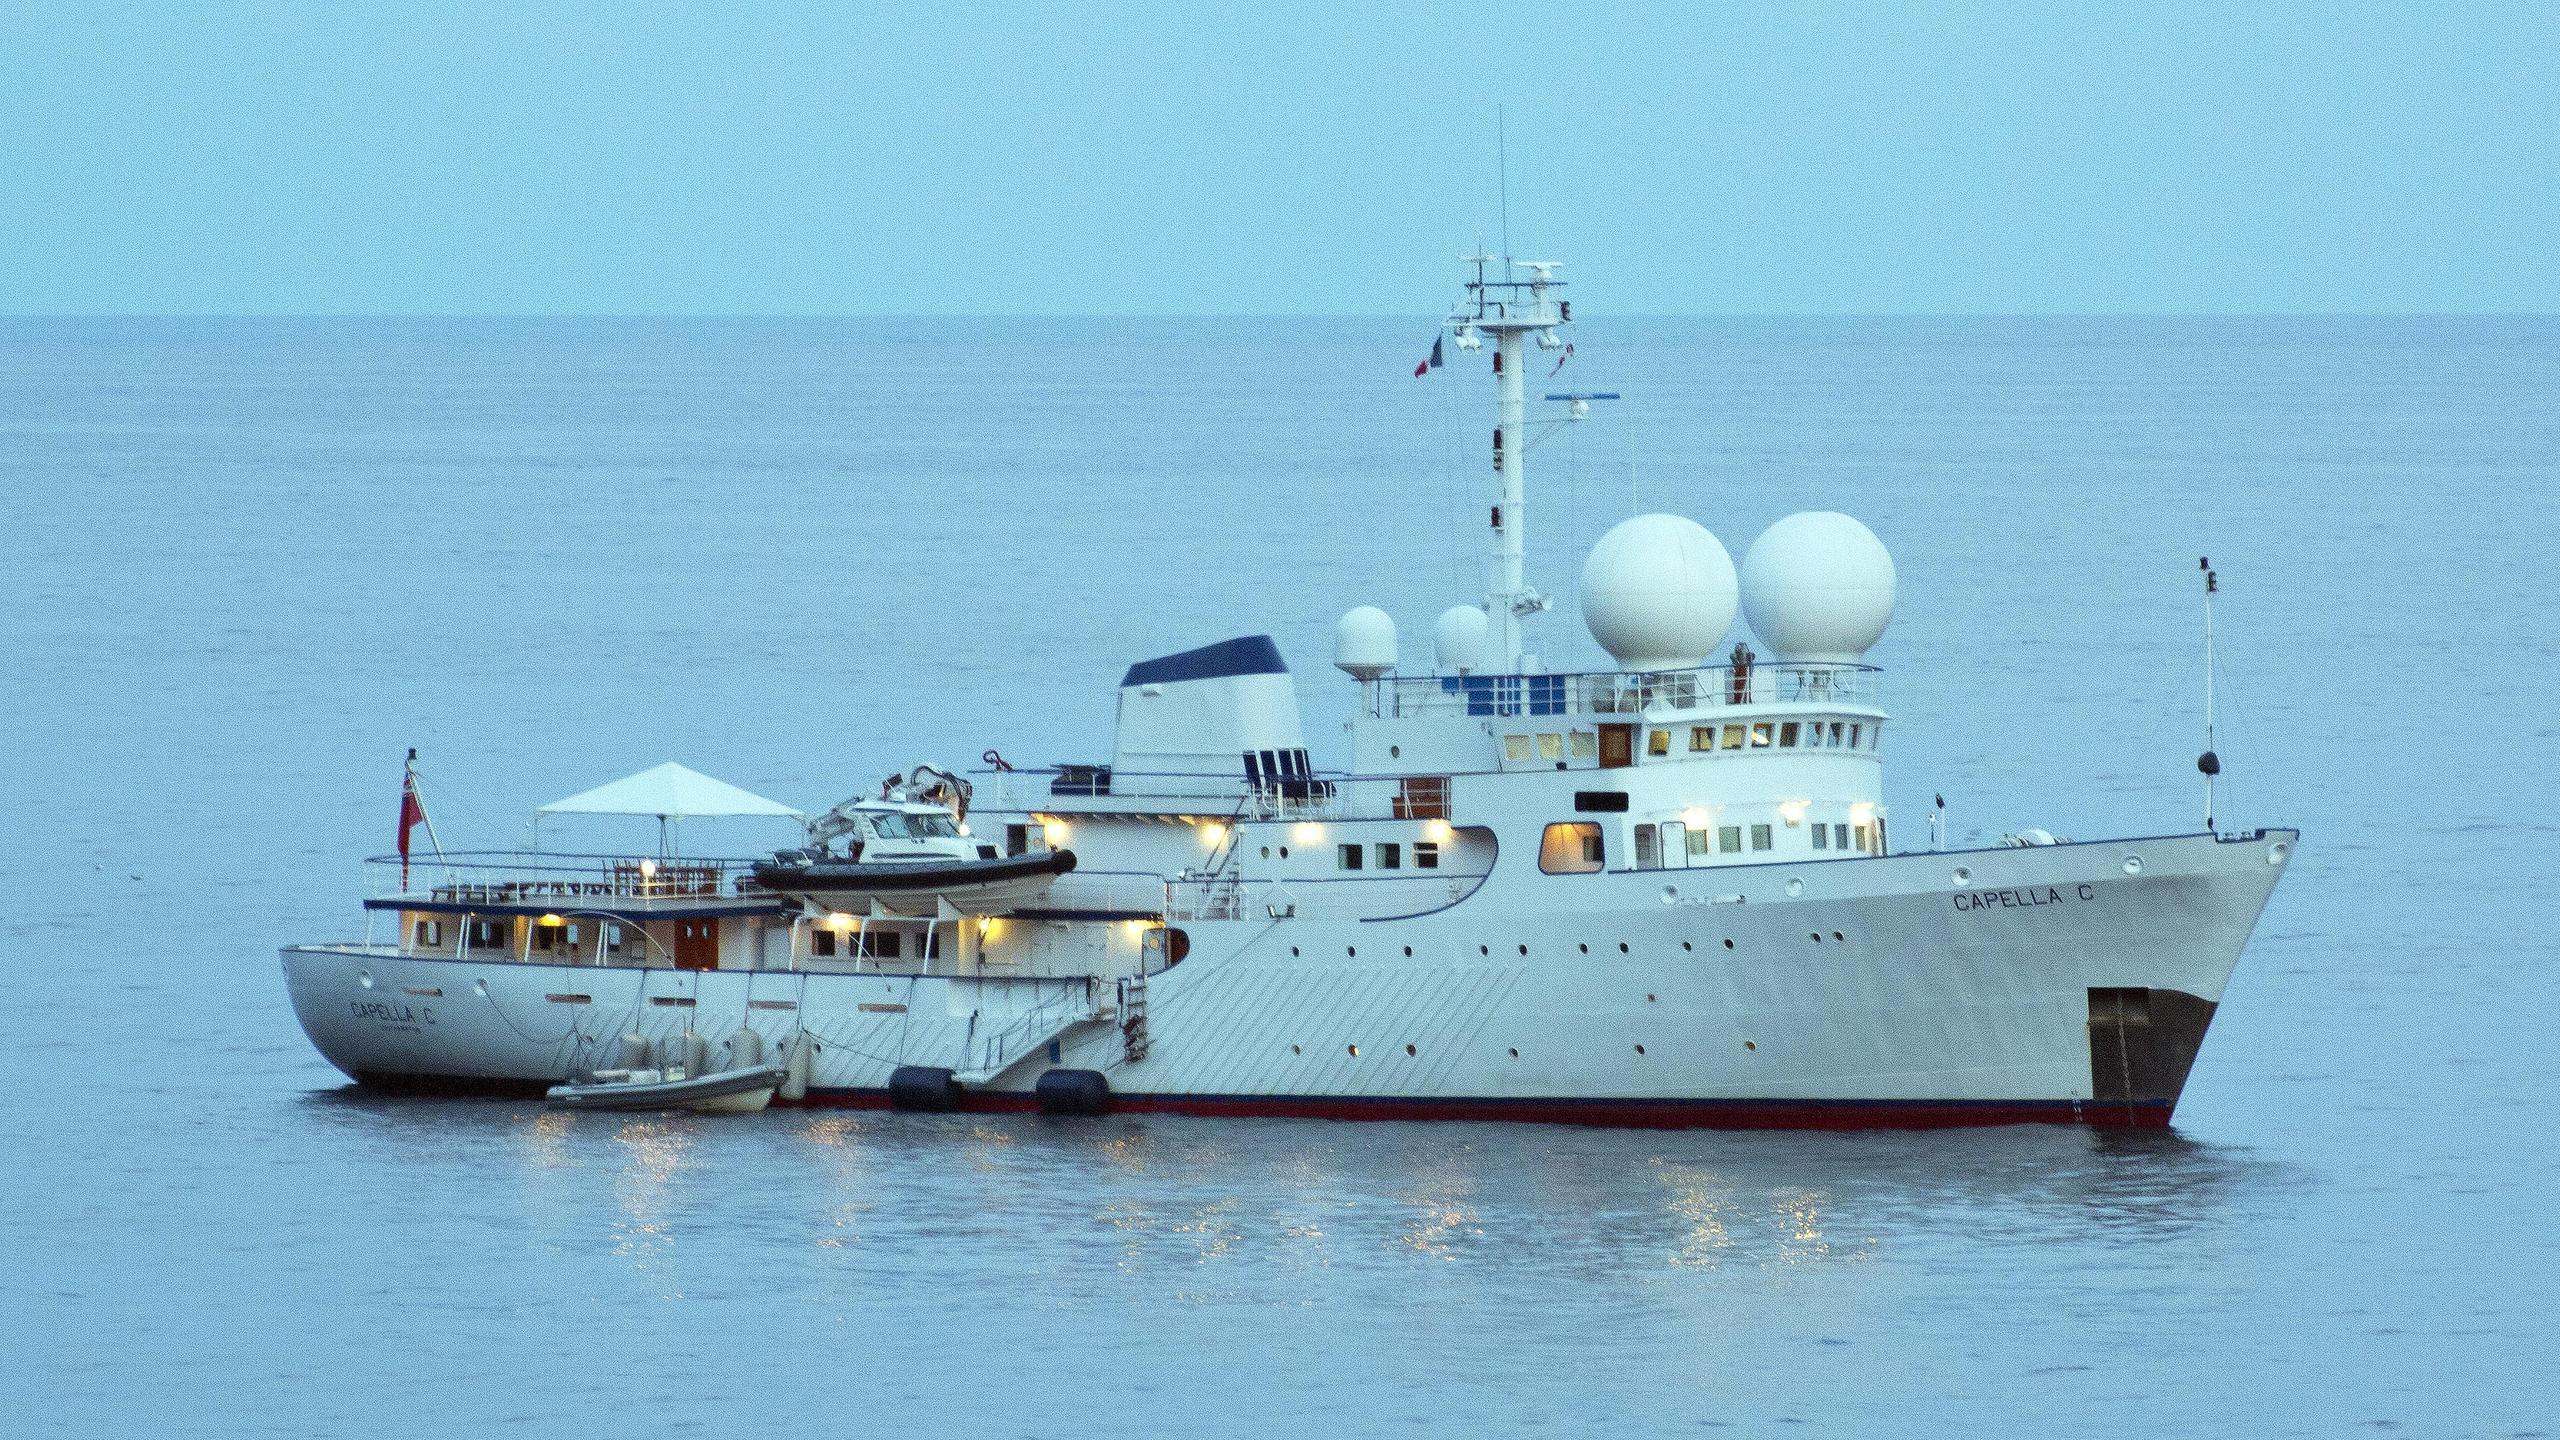 capella-c-explorer-yacht-scheepsbouwwerf-gebroeders-pot-1969-59m-half-profile